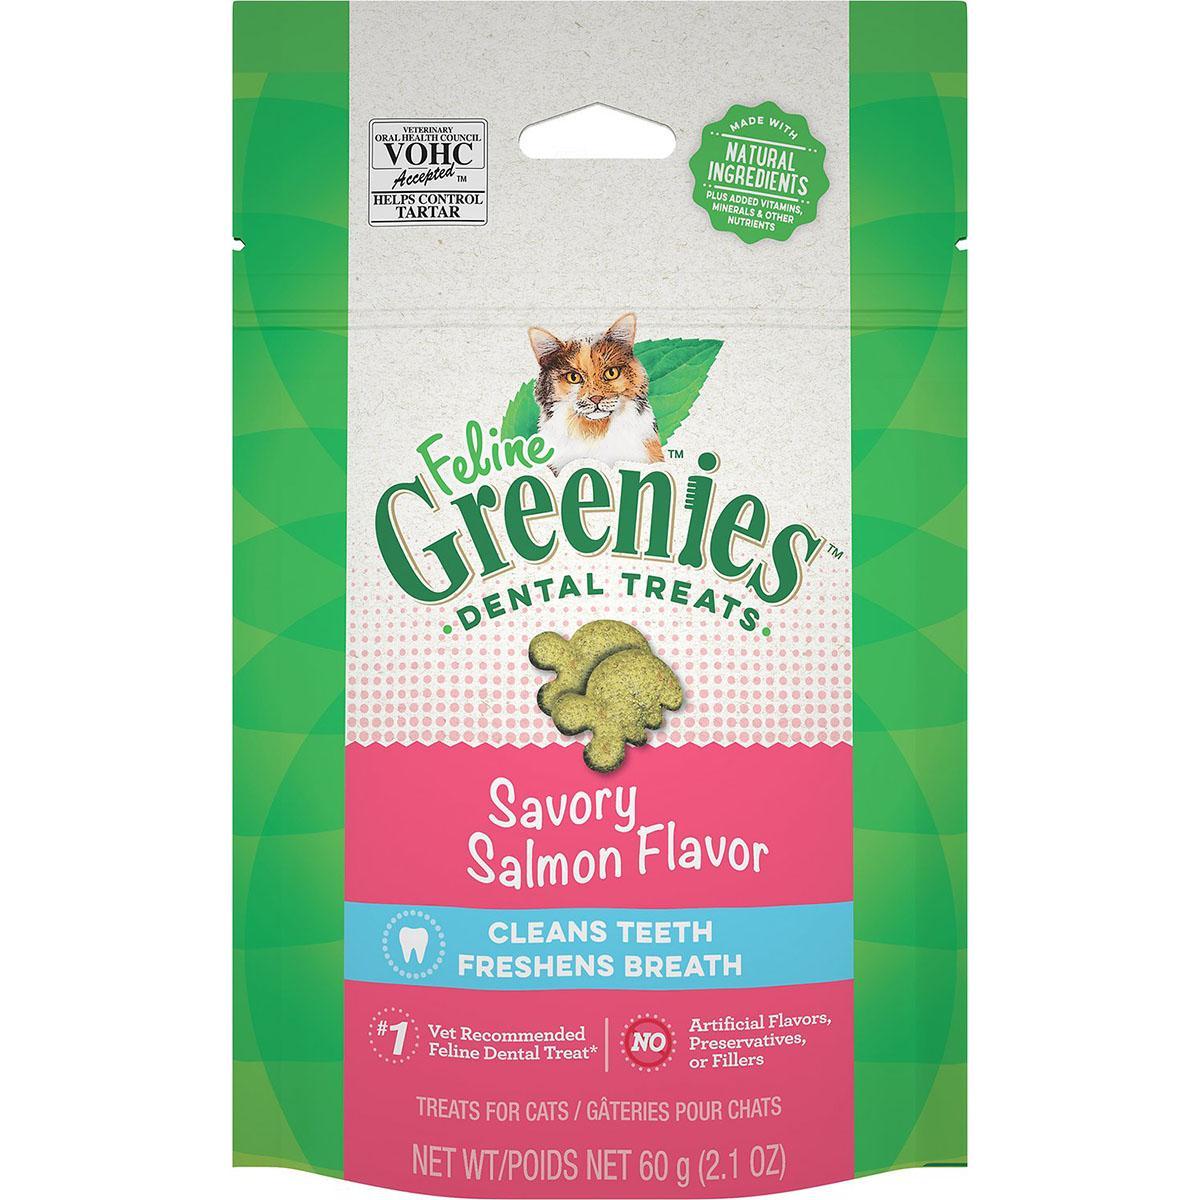 Greenies Feline Dental Cat Treats - Savory Salmon Flavor